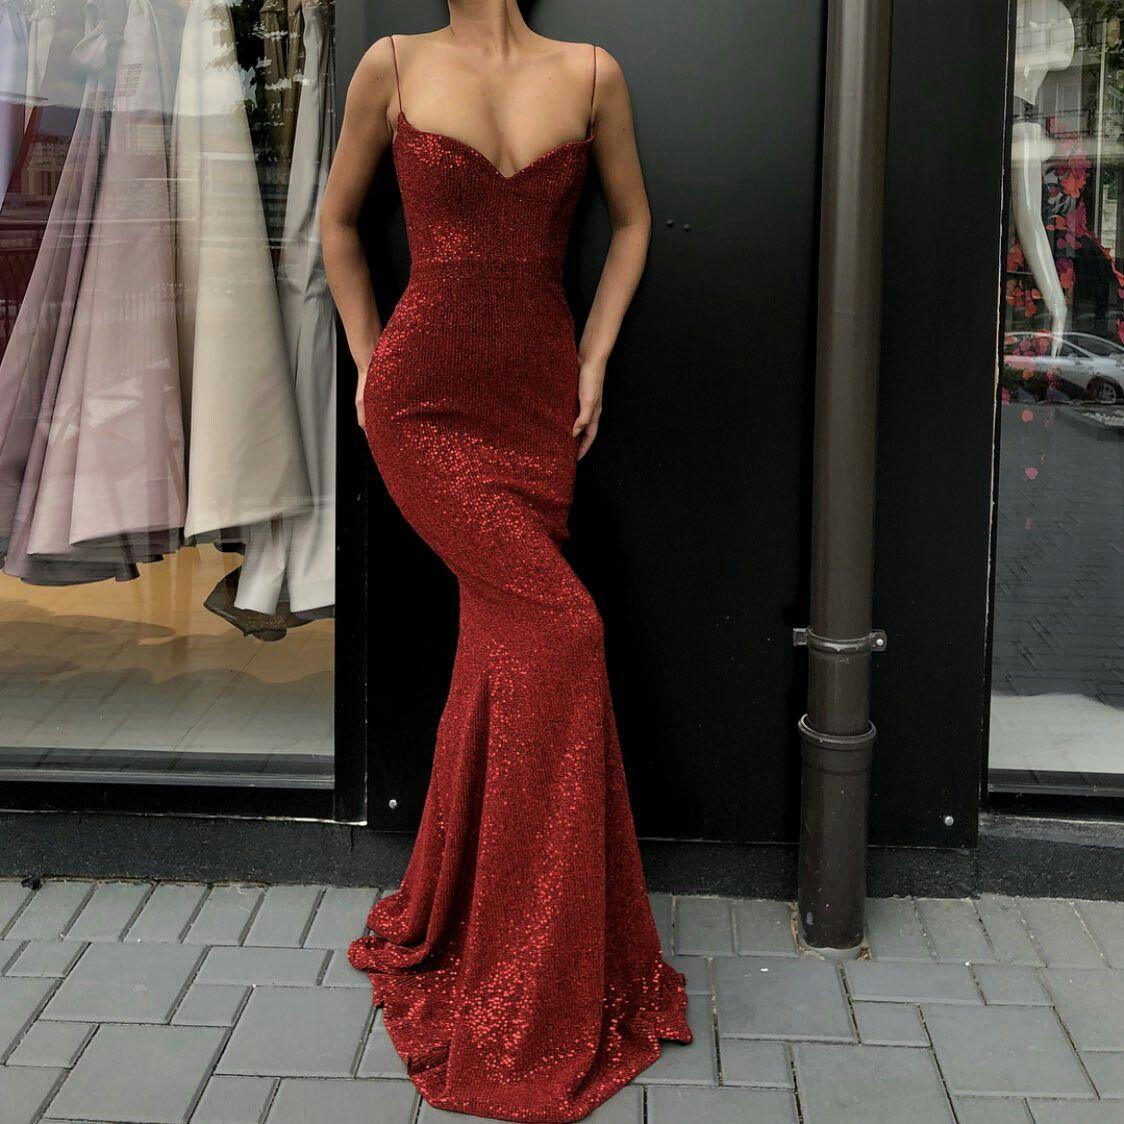 Pin by hager fadhlaoui on robe de rêve pinterest dresses